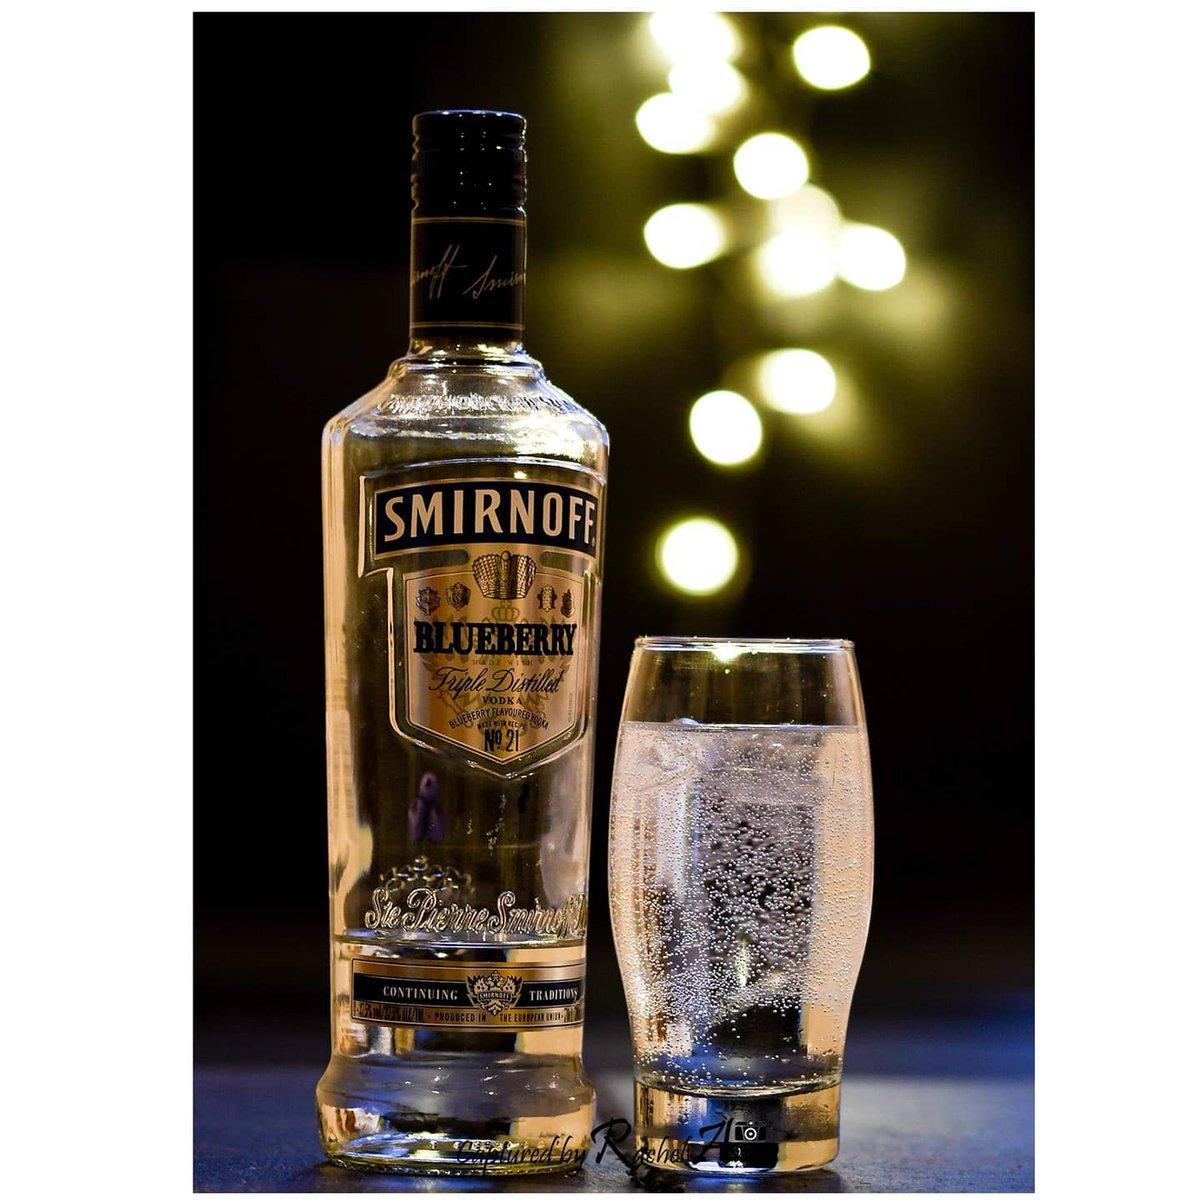 A bit of Bokeh of my favourite tipple!  #nikon #nikonphotography #nikond500 #capturedbyrachelanne #vodka #smirnoff #ciroc #bokeh #bokehphotography @ Llanbradach, Caerphilly, United Kingdom pic.twitter.com/jKuno8fxTY